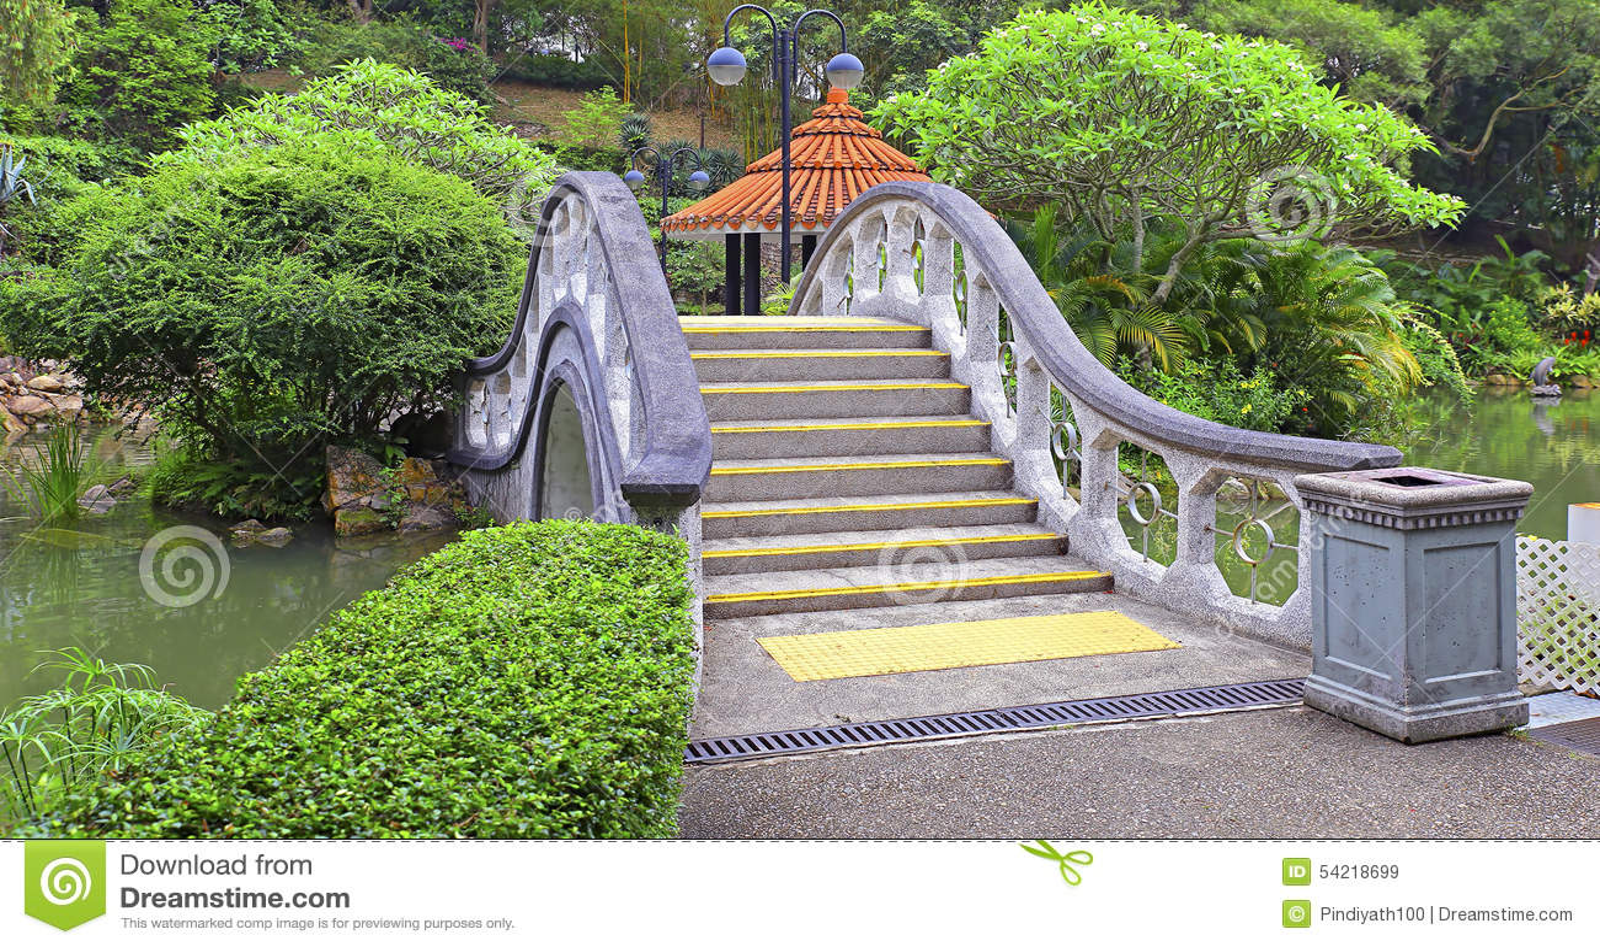 Garden Bridges Costco : Garden arch bridge images ftempo